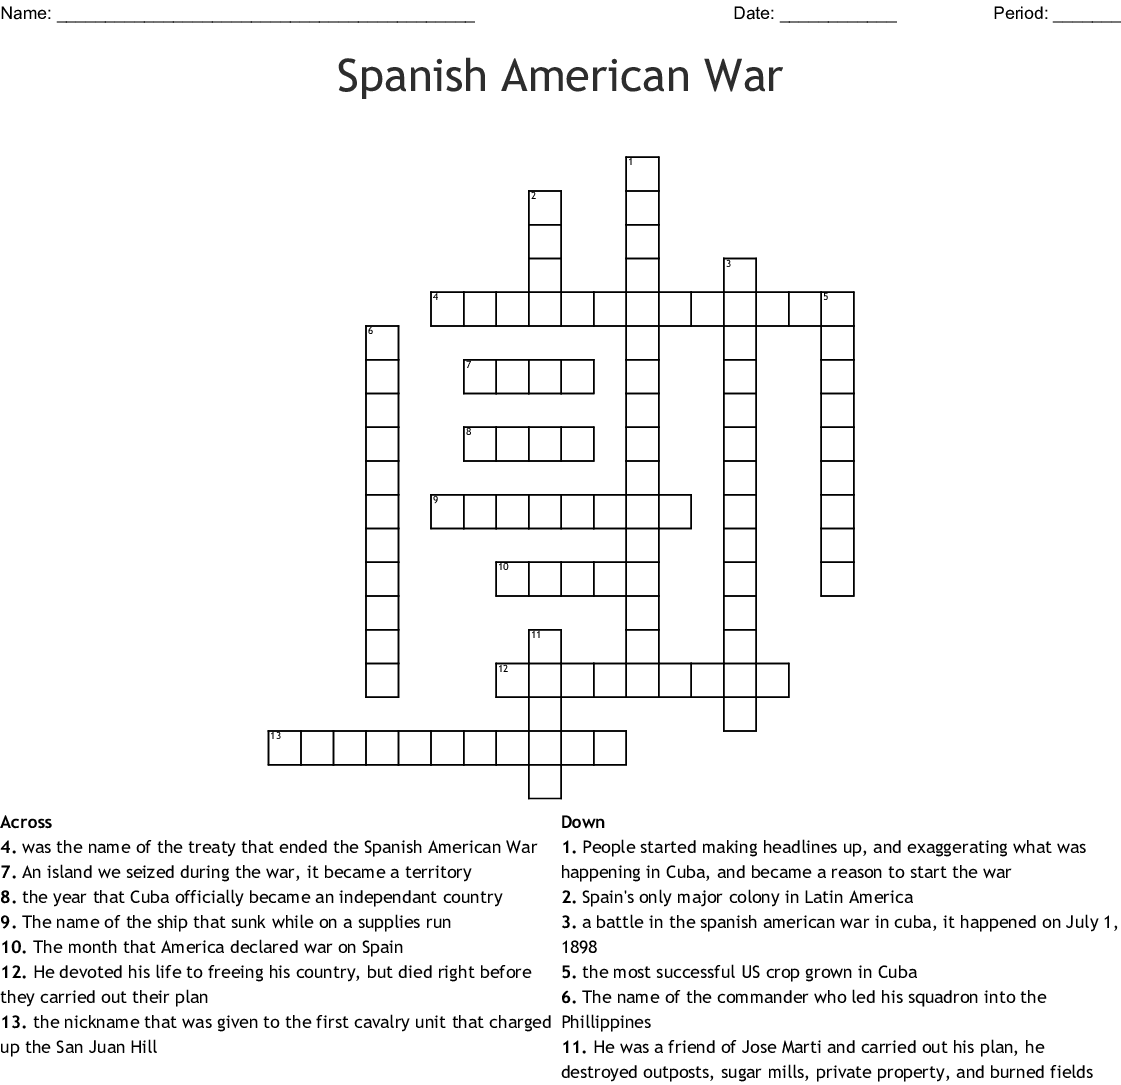 Spanish American War Crossword